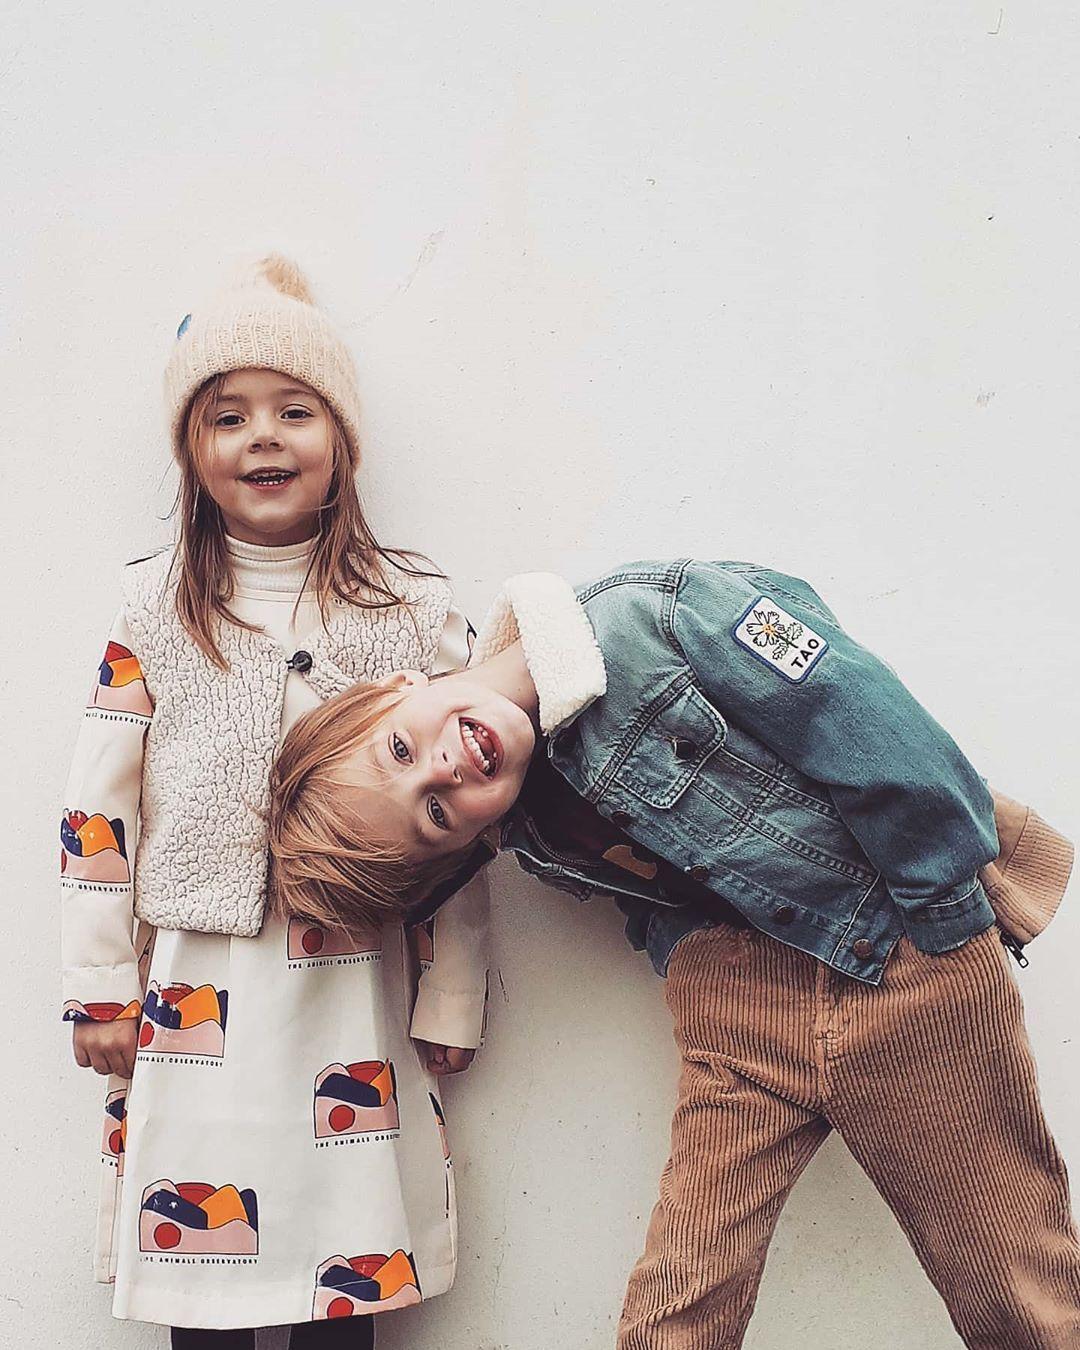 "Coosje & Julius on Instagram: ""Two peas  #inapod #myalmosttwin #theanimalsobservatory #kidsfashion #kidsportraits  #fashionkid #fashionboy #kootd #fashiongirl #umh_kids…"""